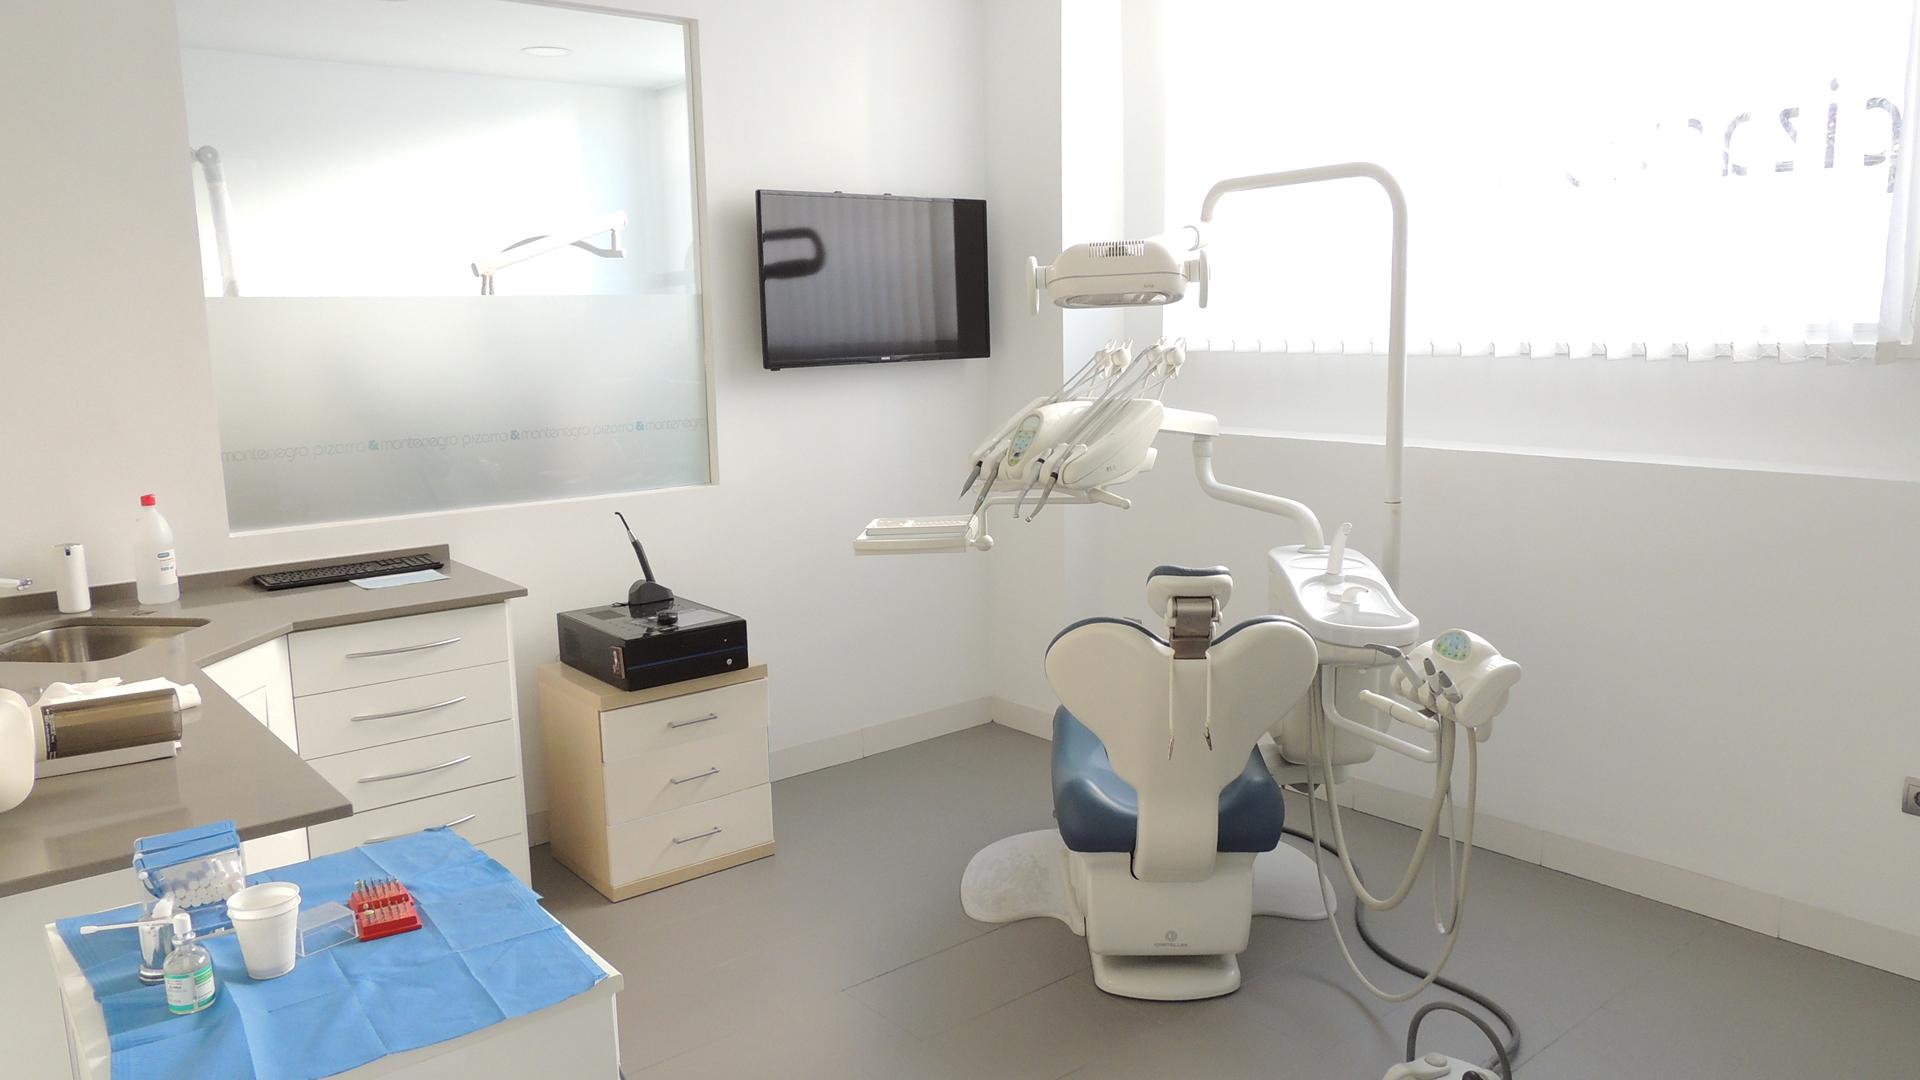 Arquitecto marcos tamagnone cl nica dental - Proyecto clinica dental ...